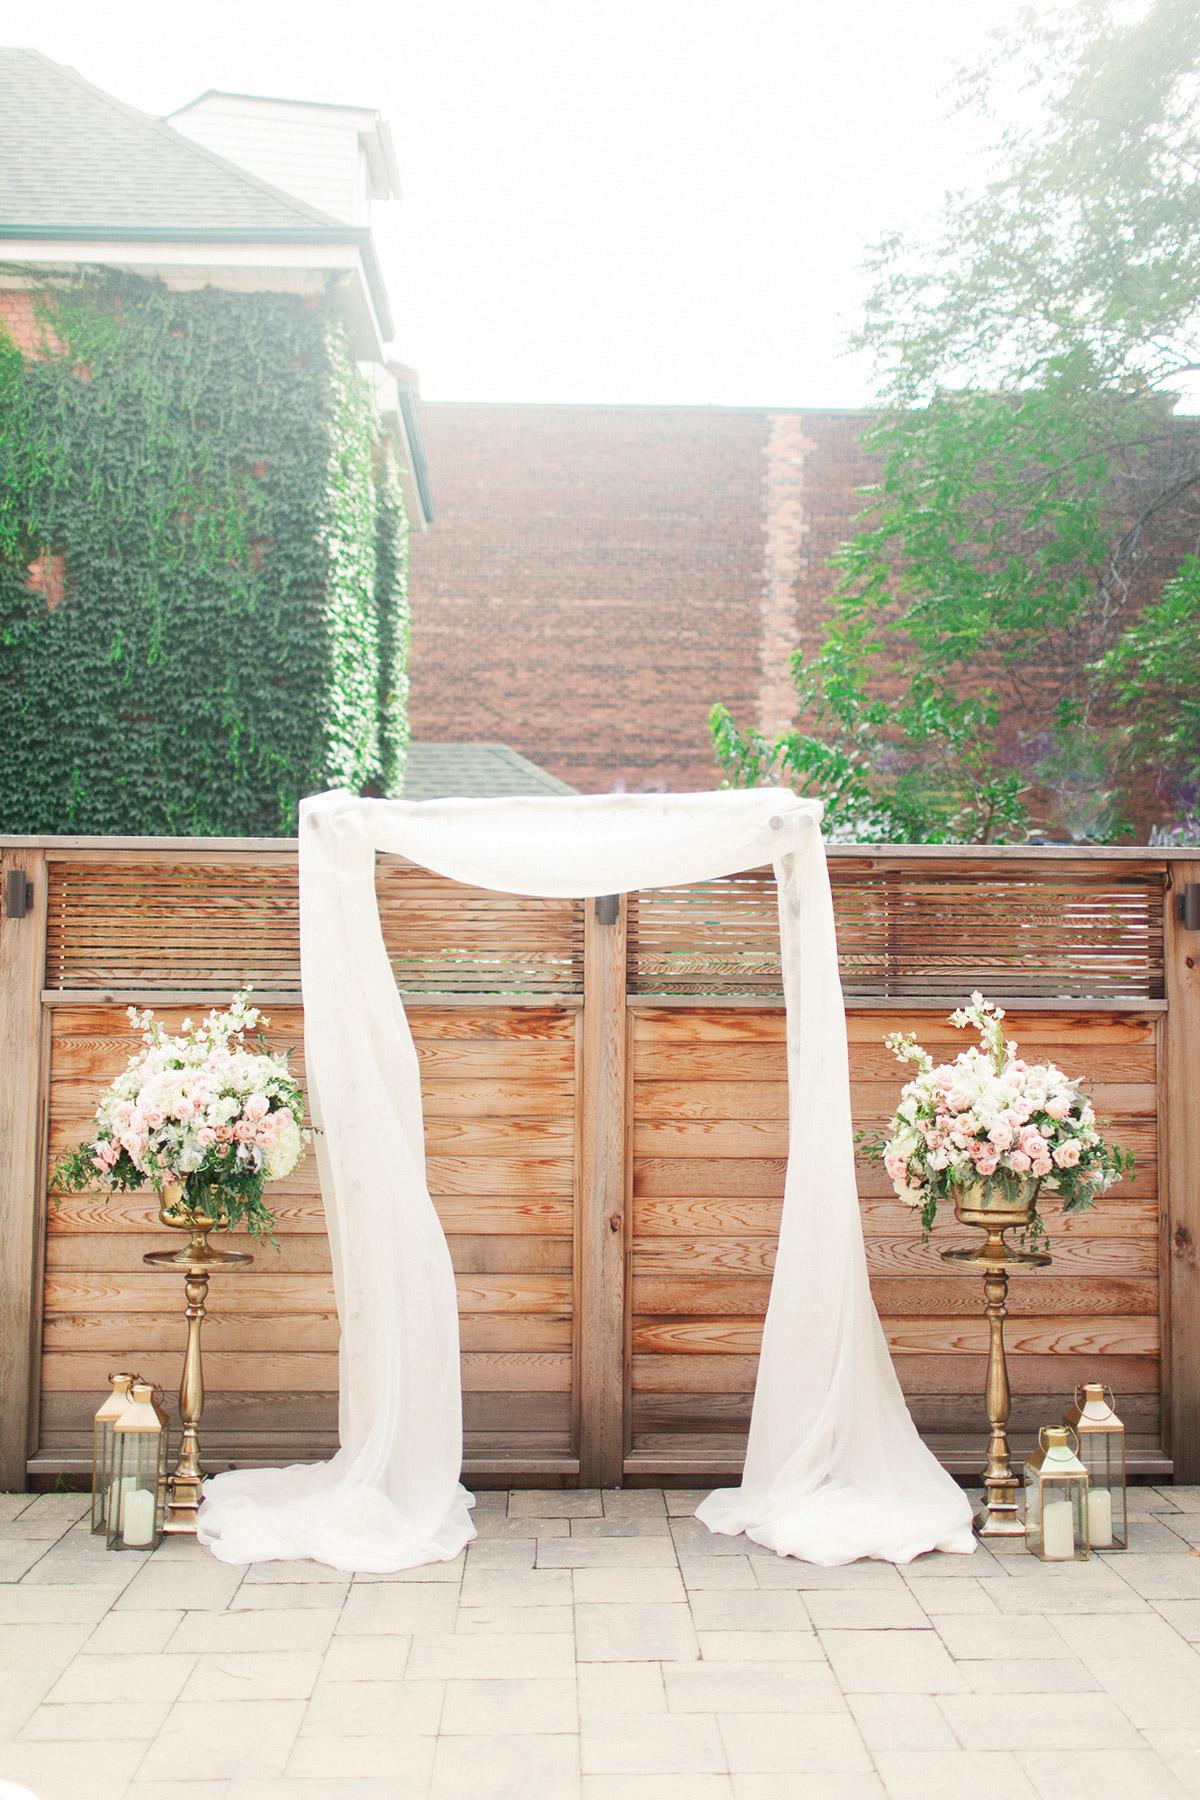 jennifer-xu-photography-vineyard-bride-swish-list-spice-factory-hamilton-wedding-27.jpg